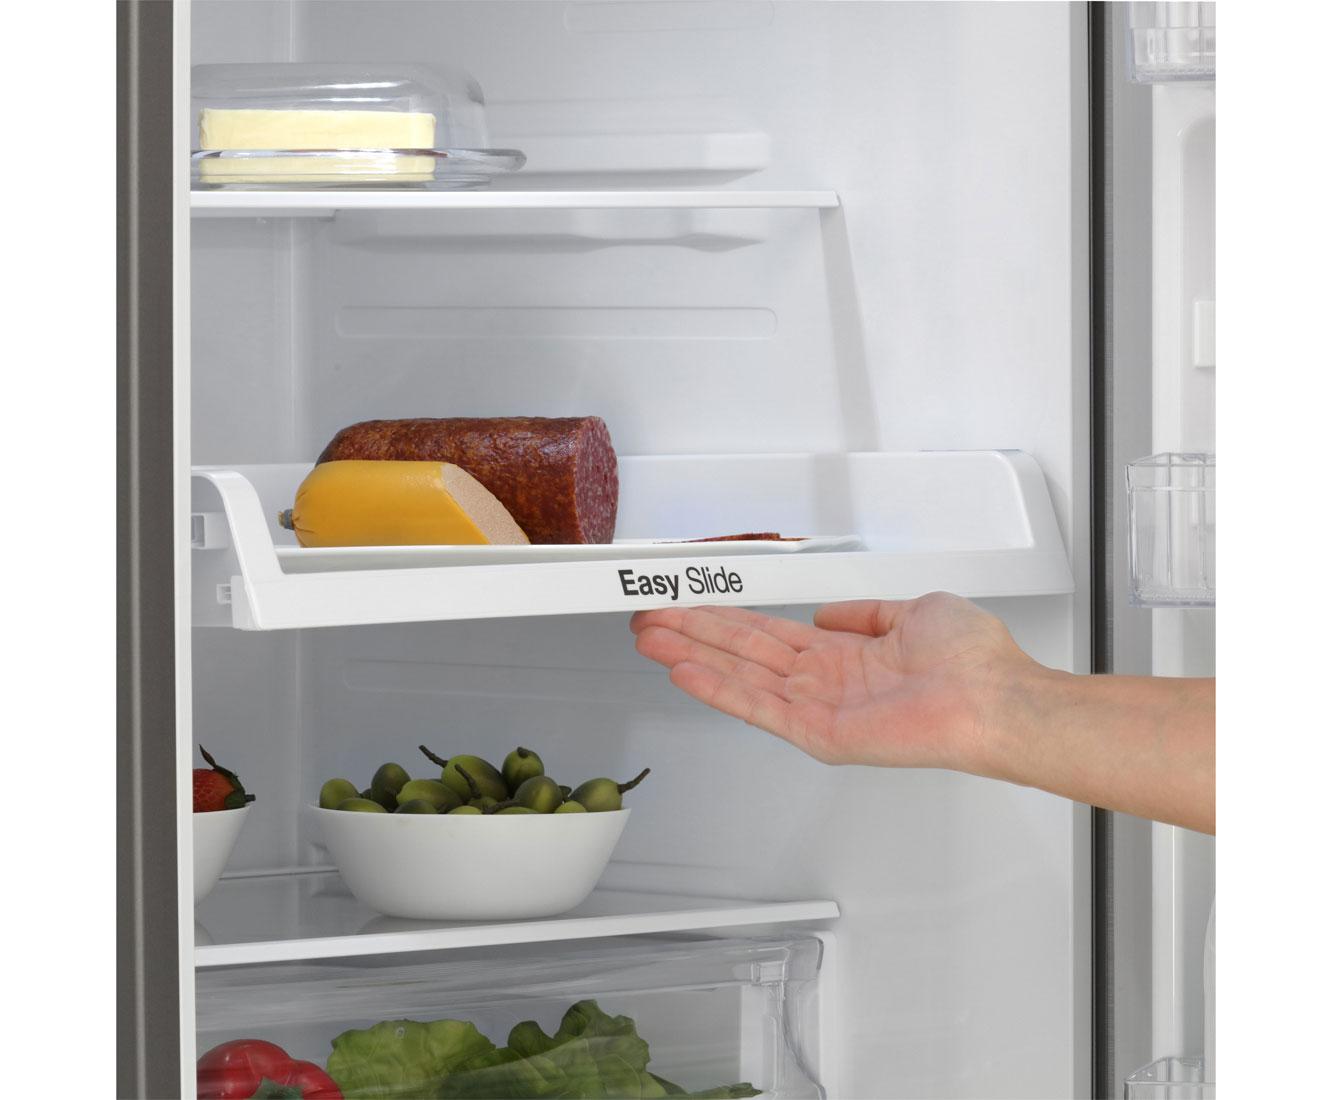 Kühlschrank Kombi : Kühlschrank kombi samsung rb her csa ef kühl gefrierkombination